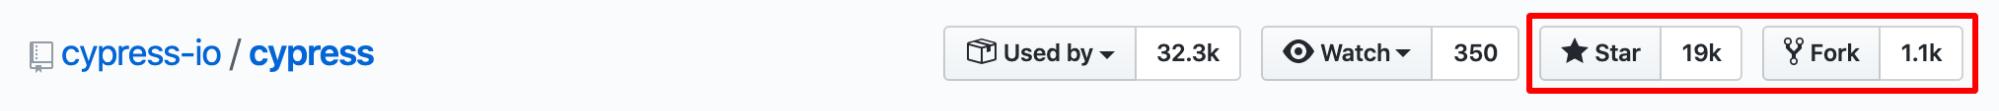 Cypress has 19K GitHub Stars and 1.1K Forks